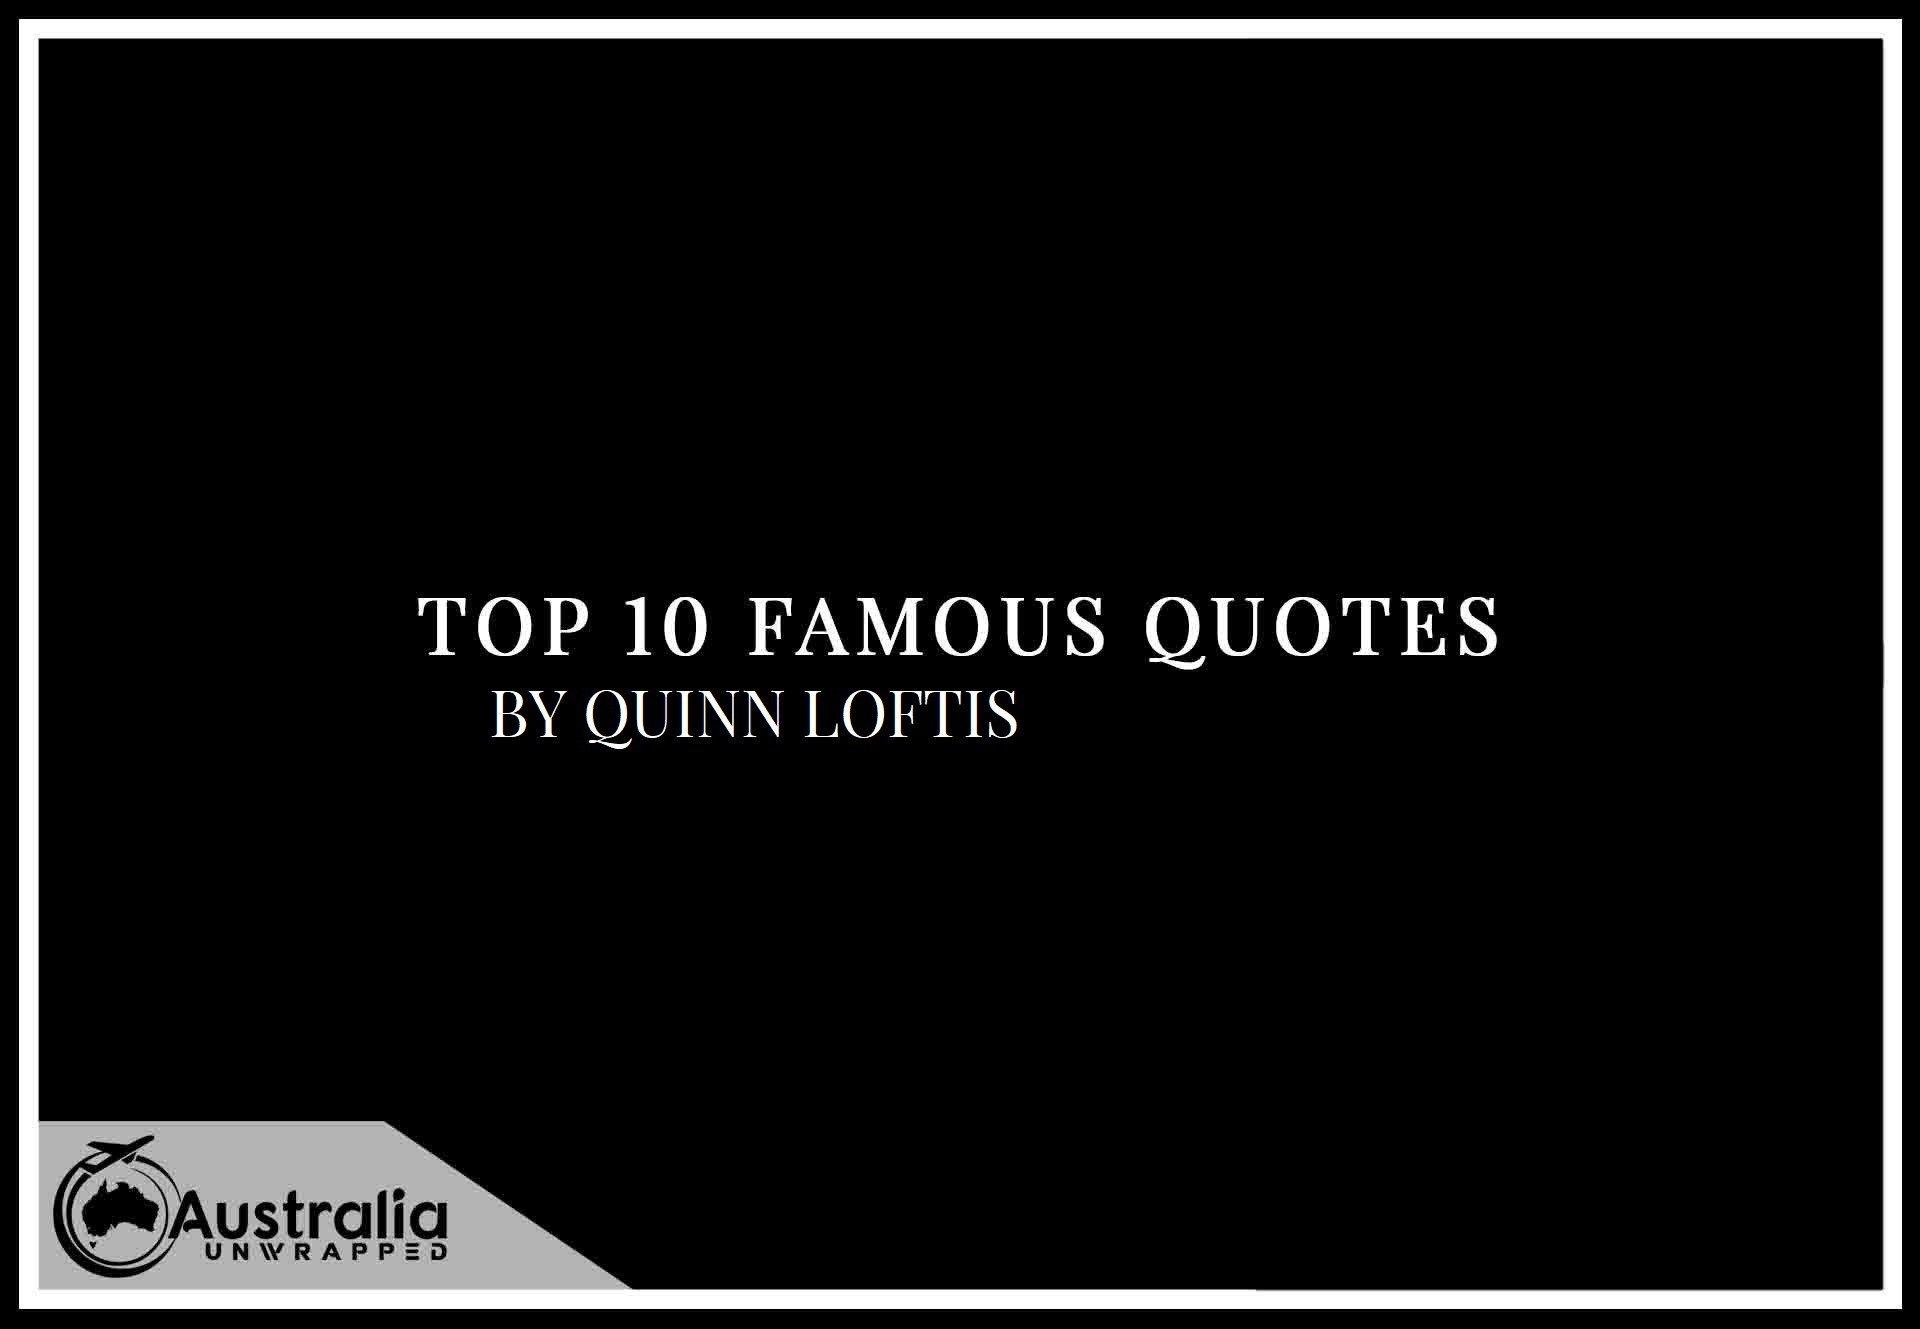 Top 10 Famous Quotes by Author Quinn Loftis